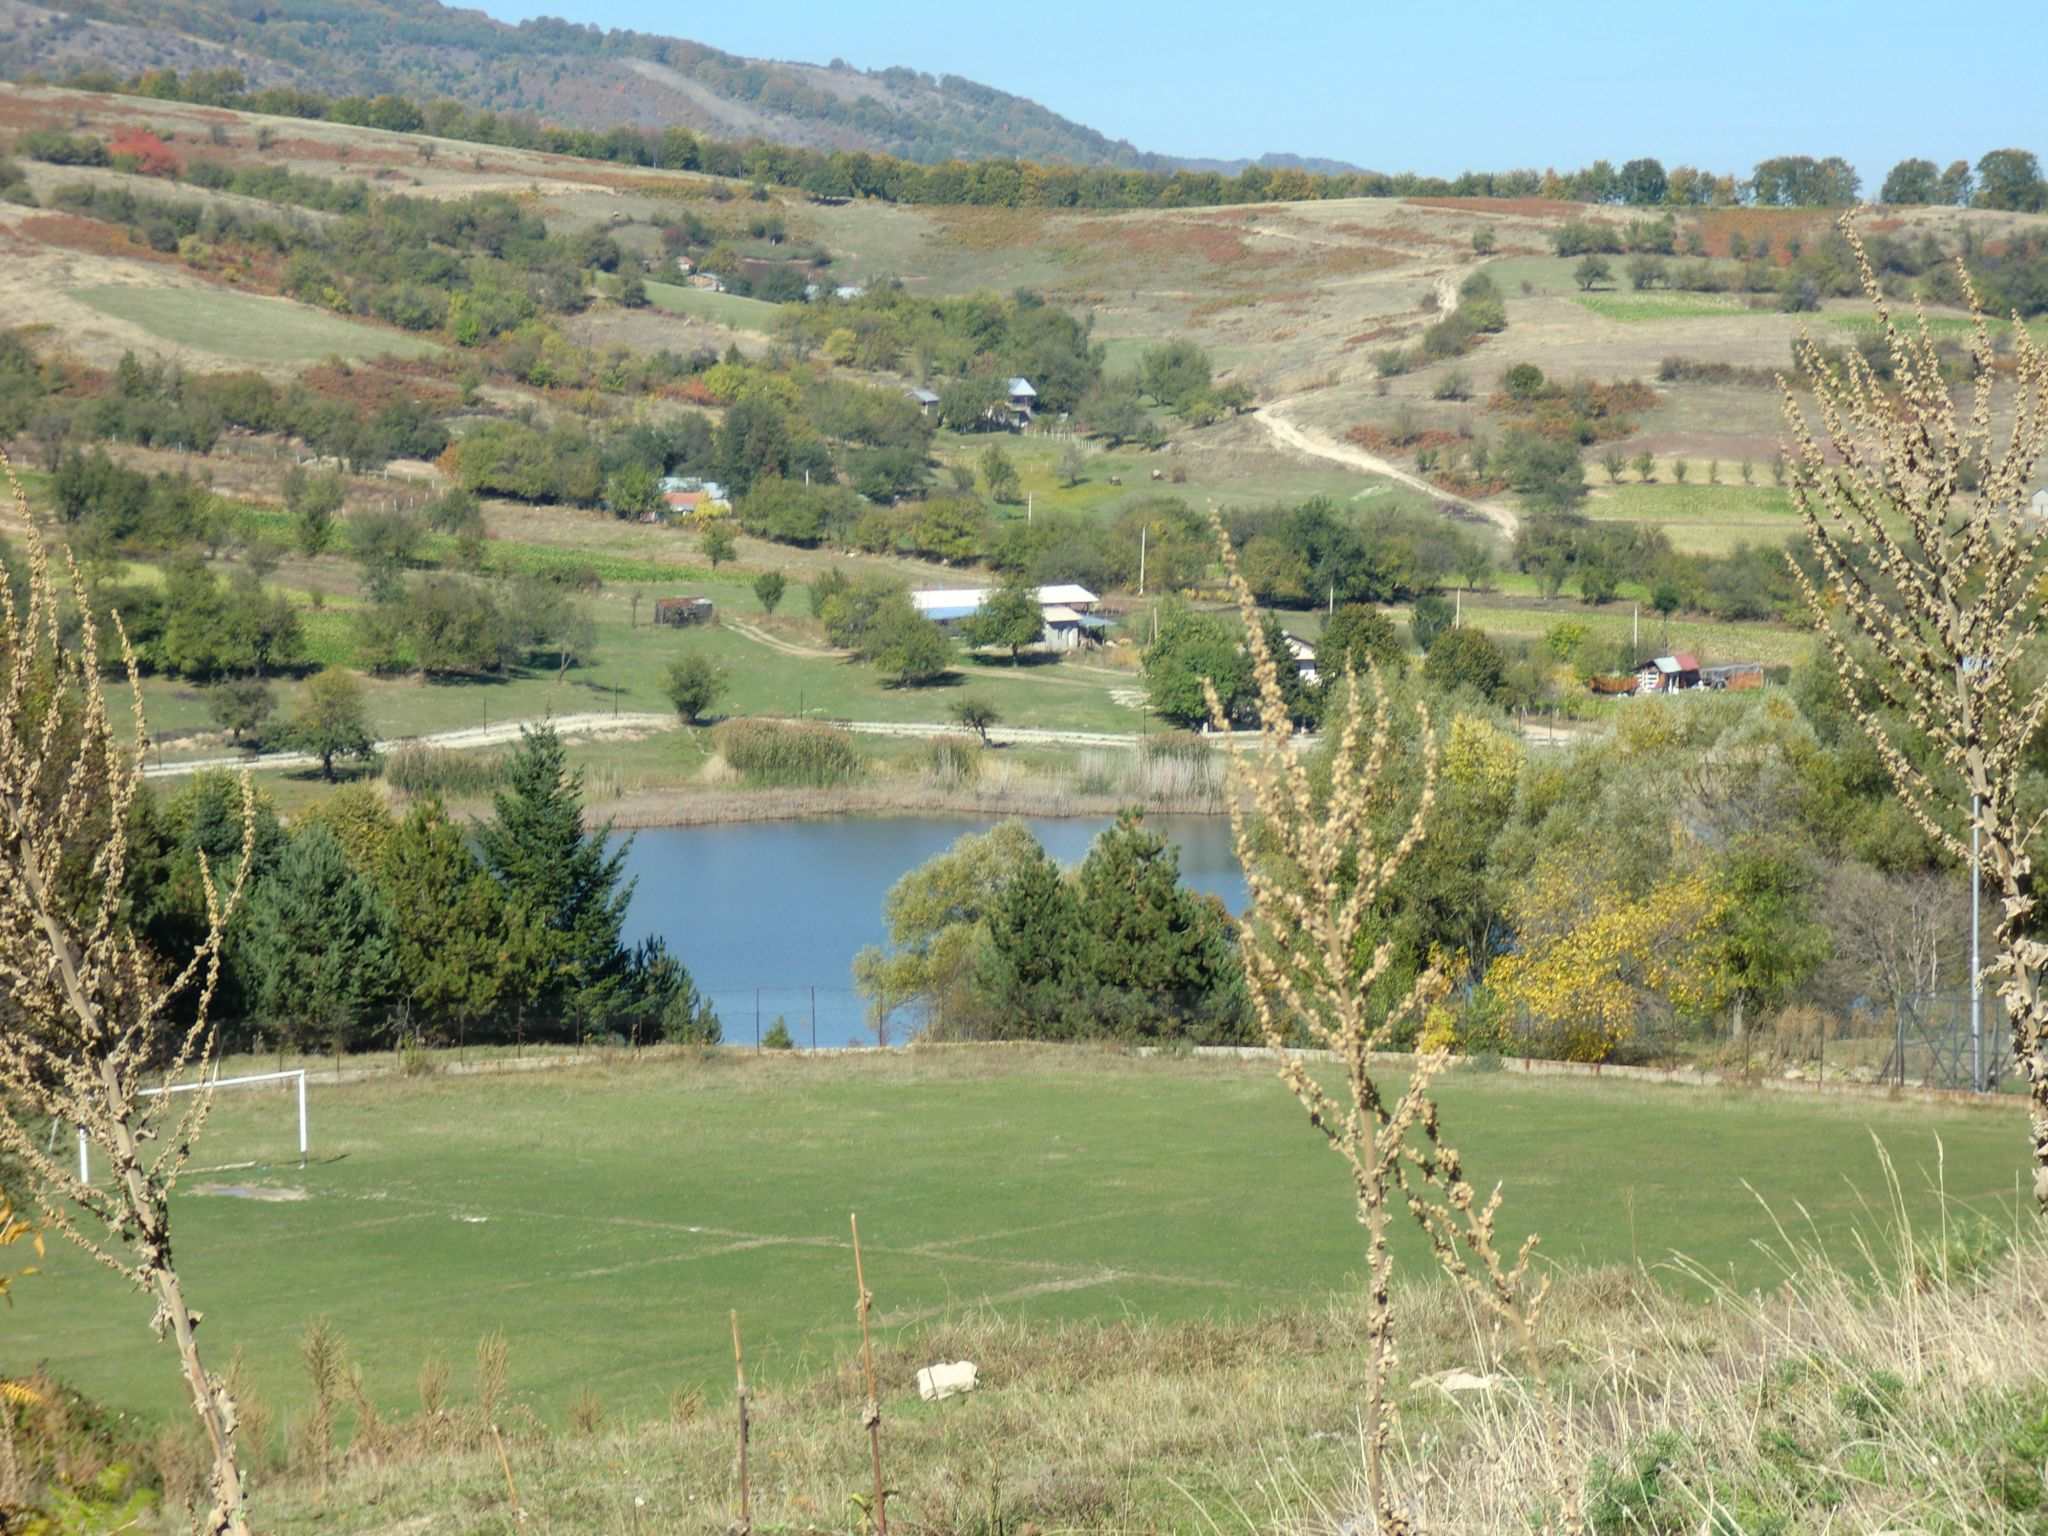 CIMG0142 - Macedonian landscapes